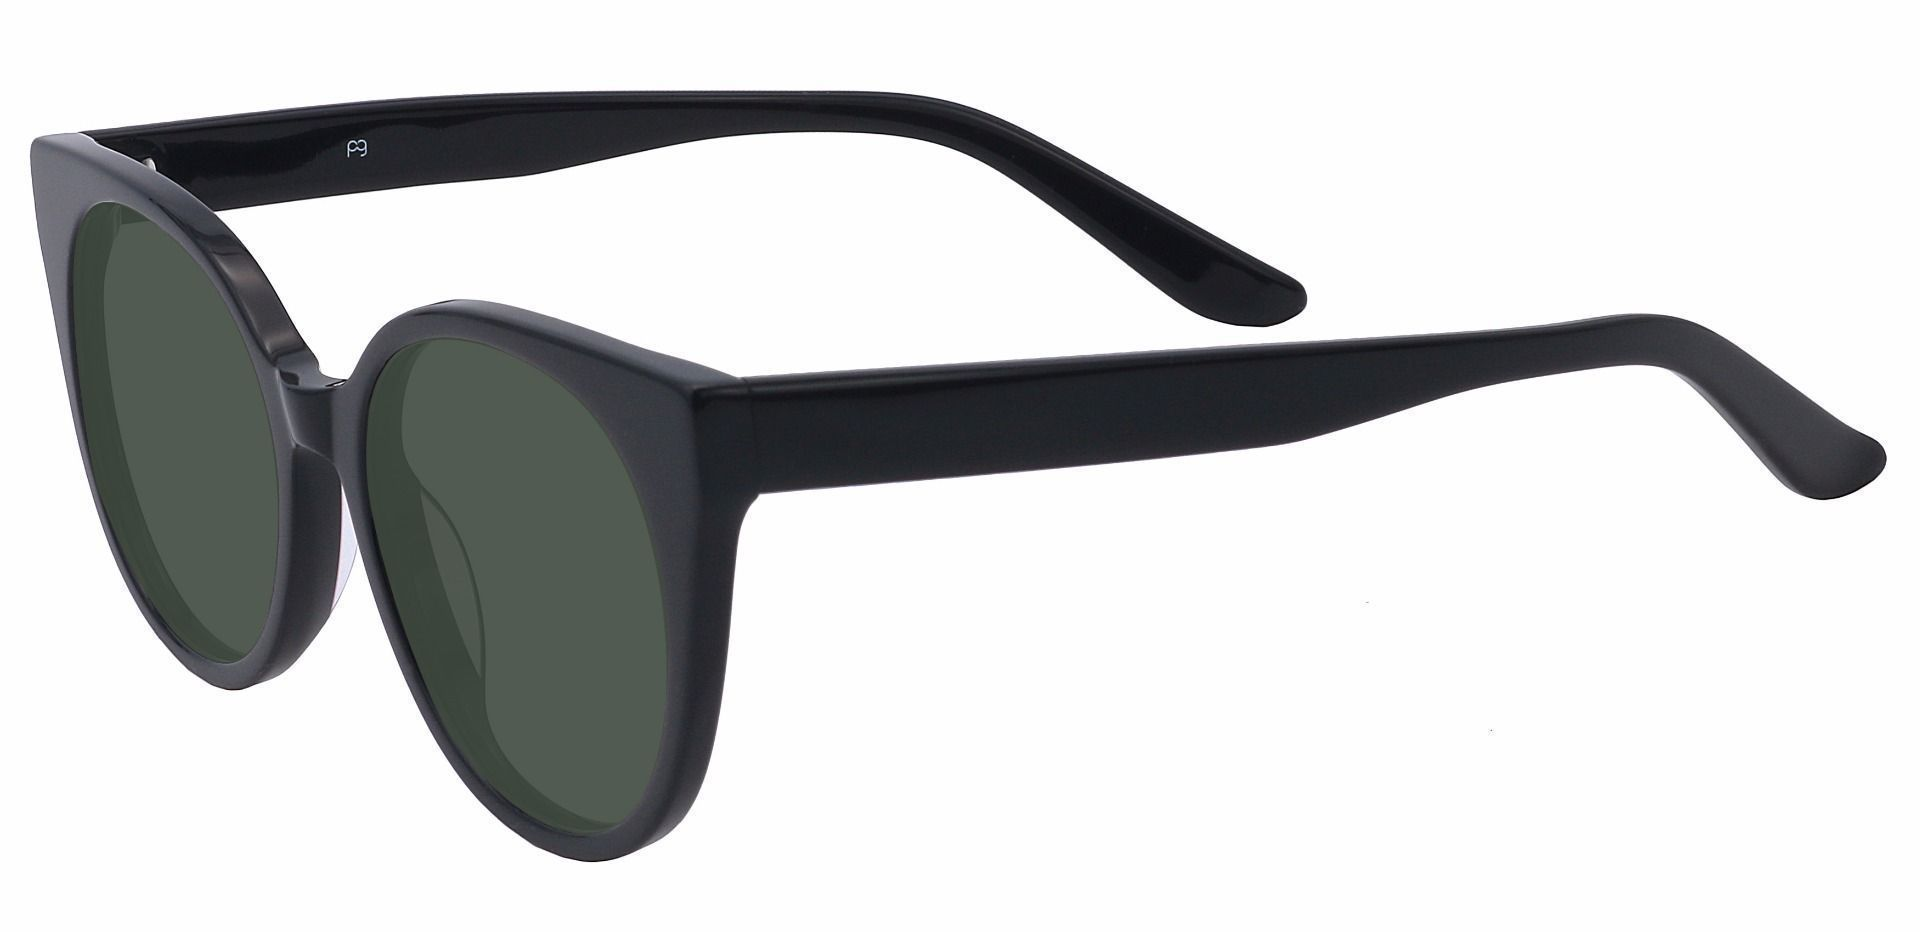 Balmoral Cat-Eye Single Vision Sunglasses - Black Frame With Green Lenses